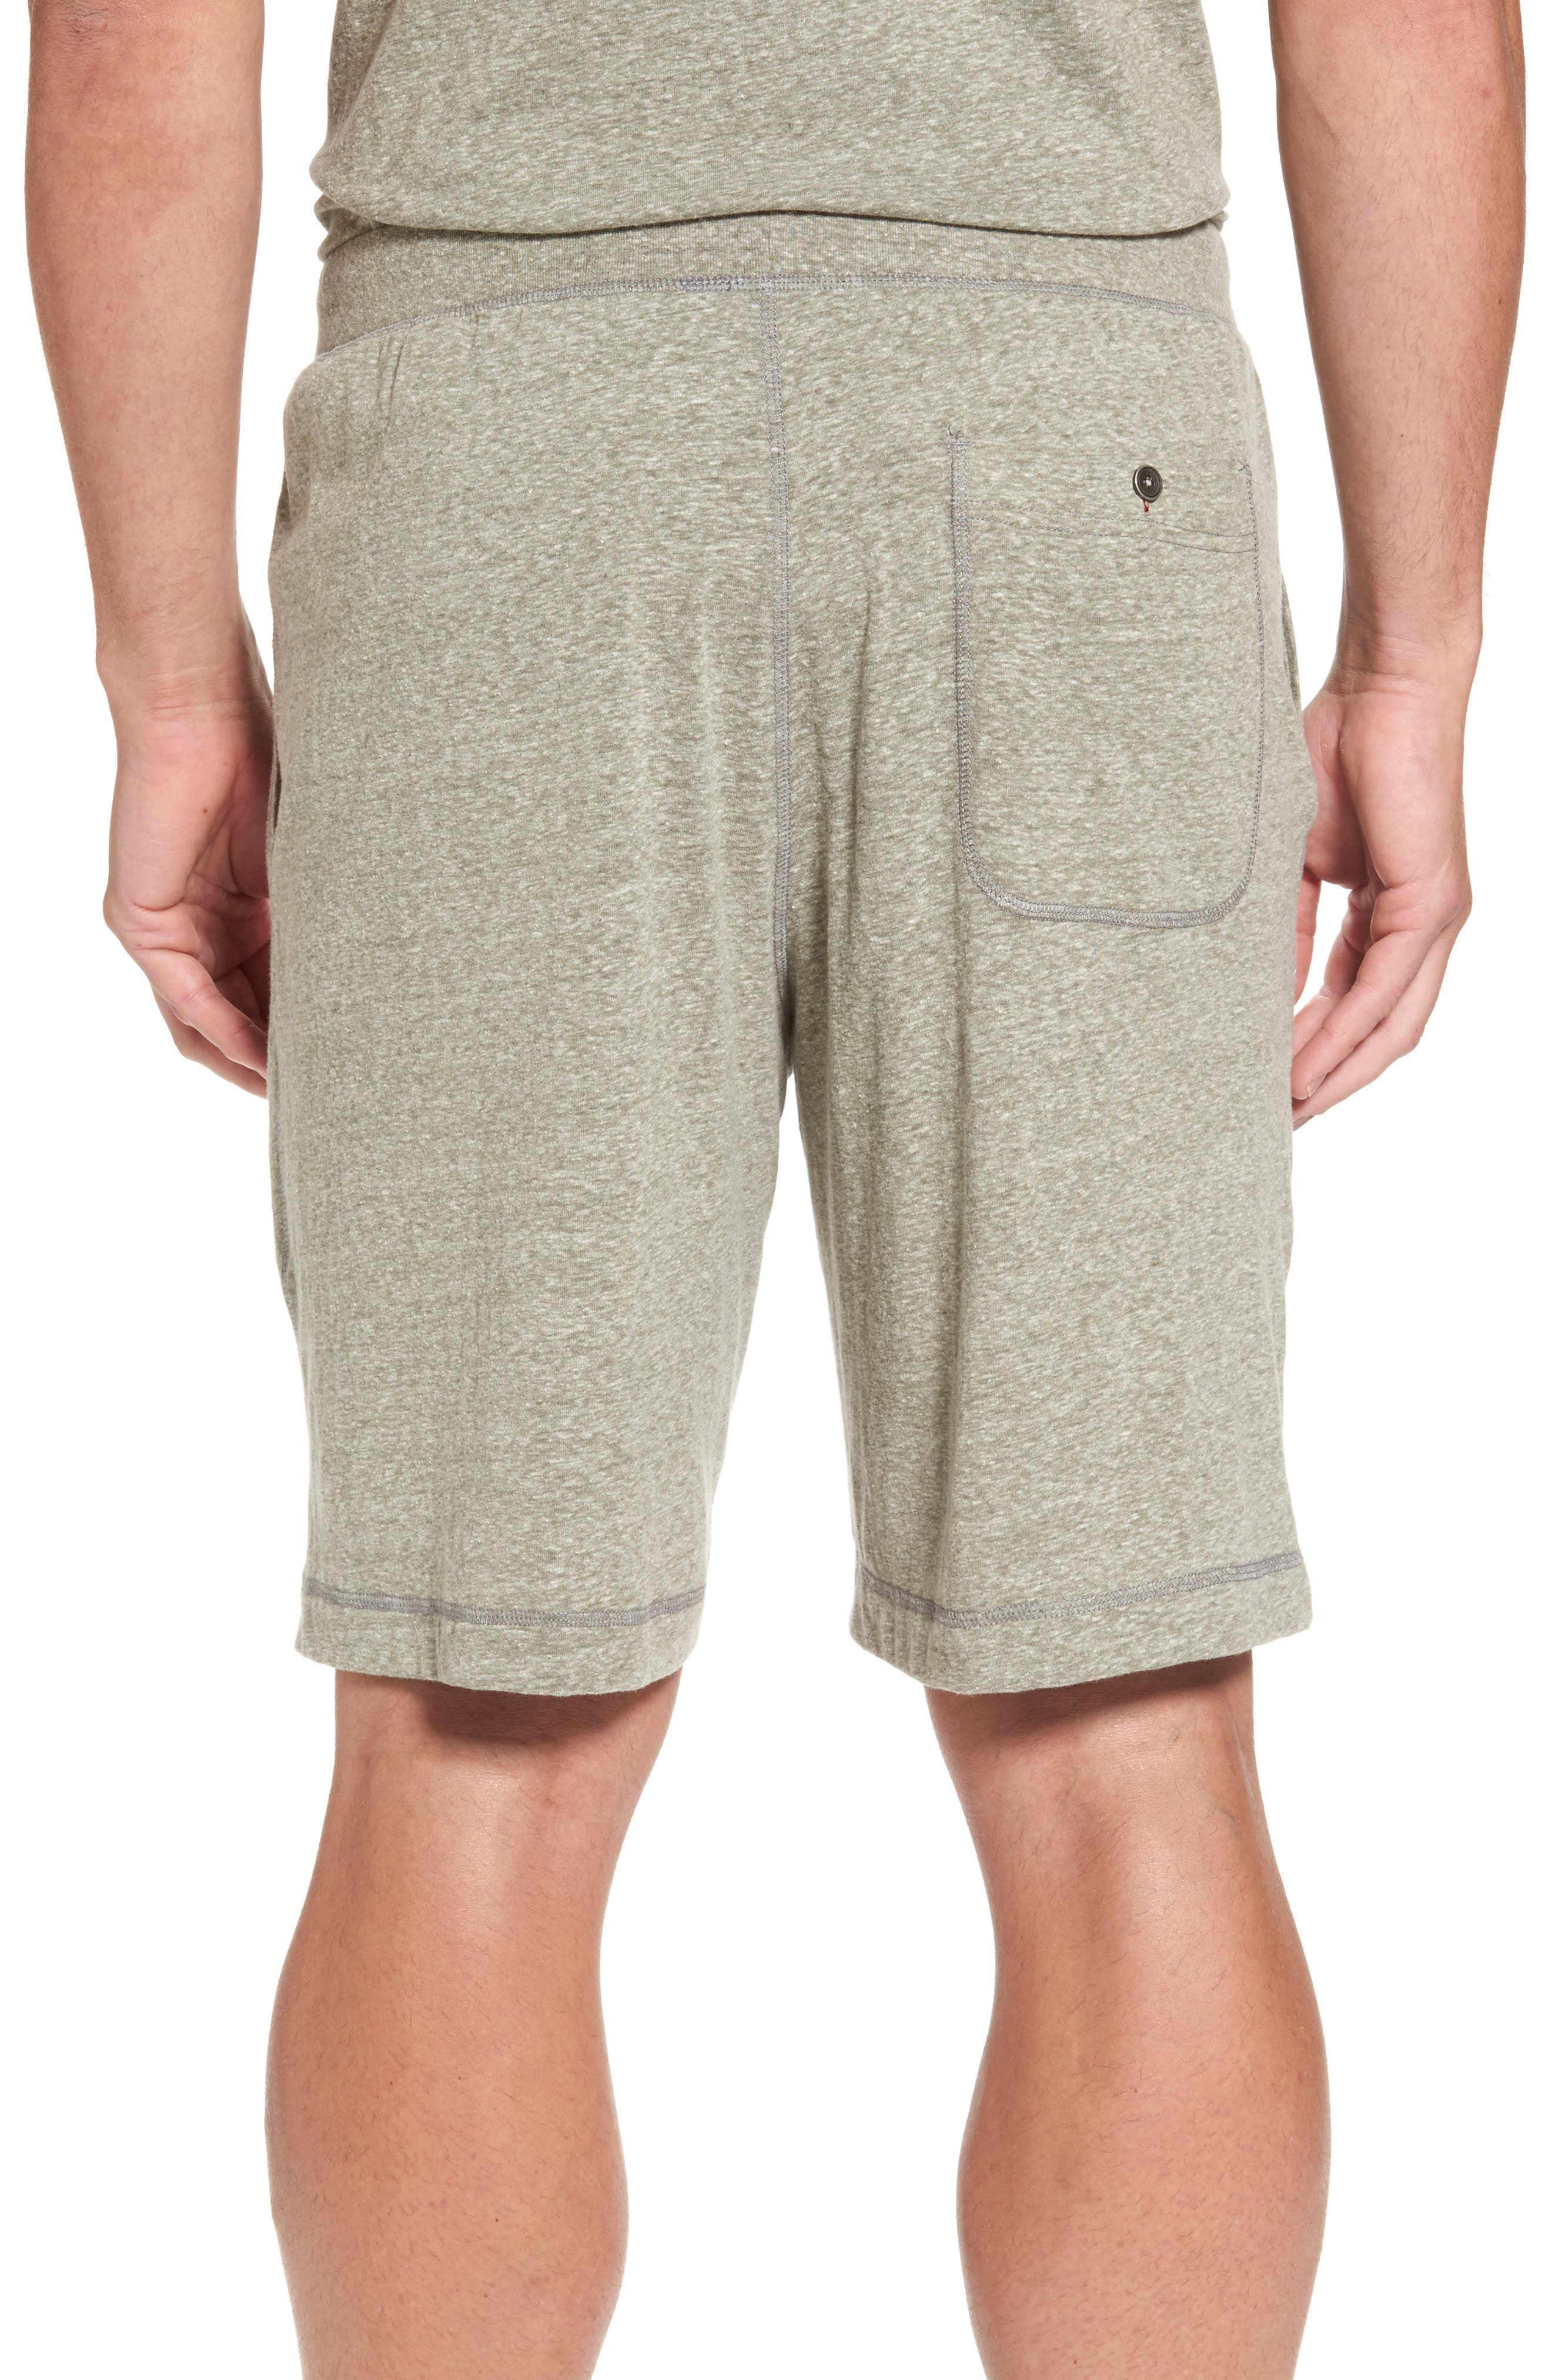 Lounge Shorts,                             Alternate thumbnail 2, color,                             301